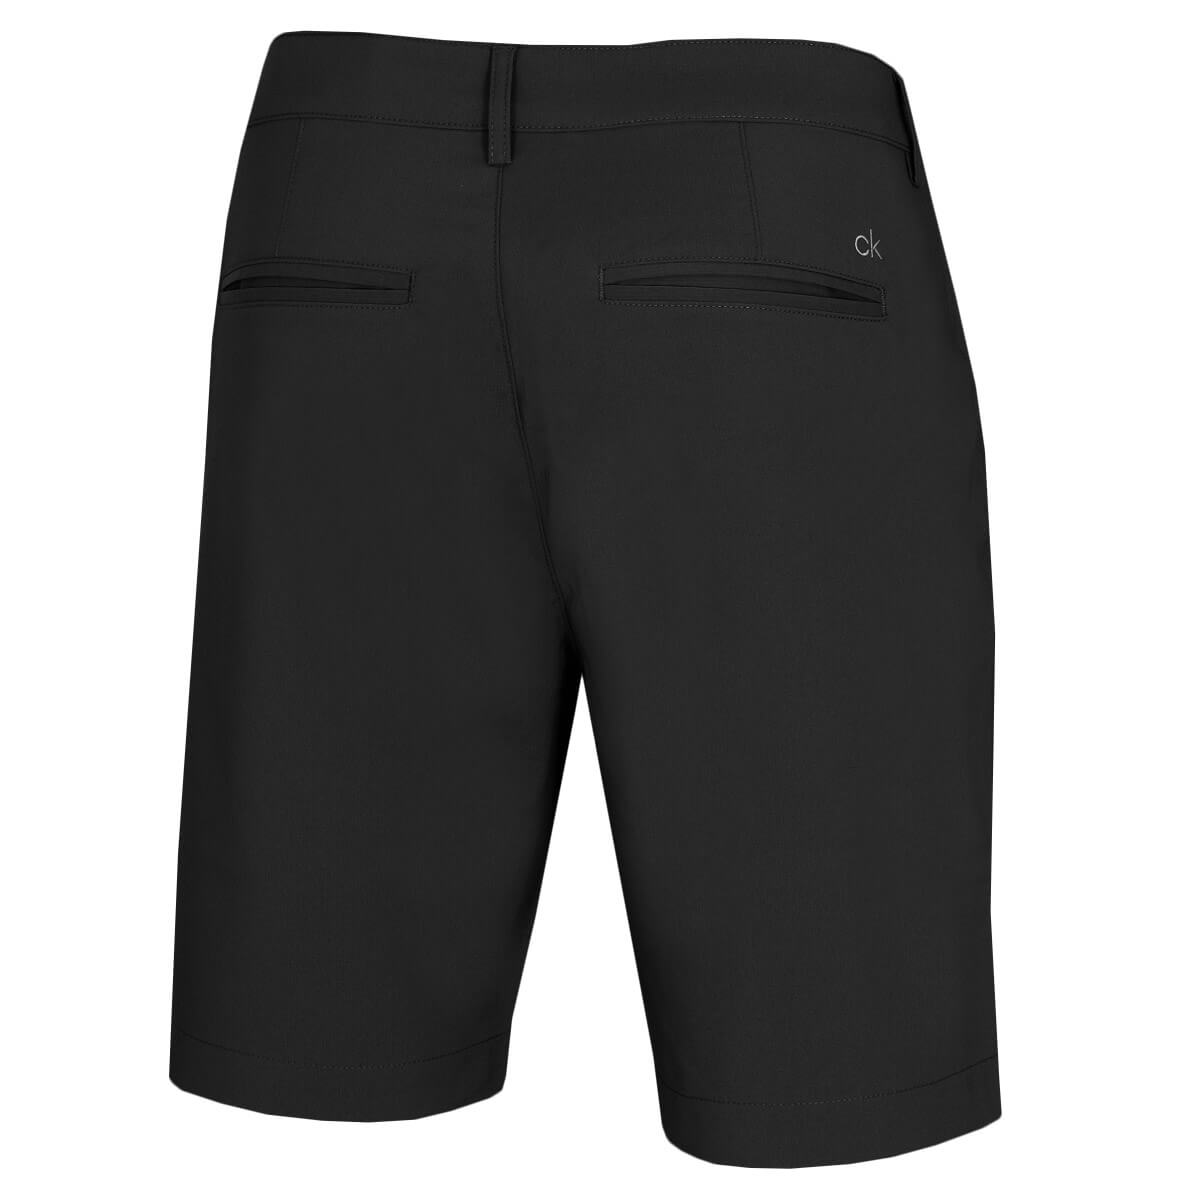 thumbnail 3 - Calvin Klein Mens 2021 Slim Fit Micro Tech Lightweight Golf Shorts 34% OFF RRP